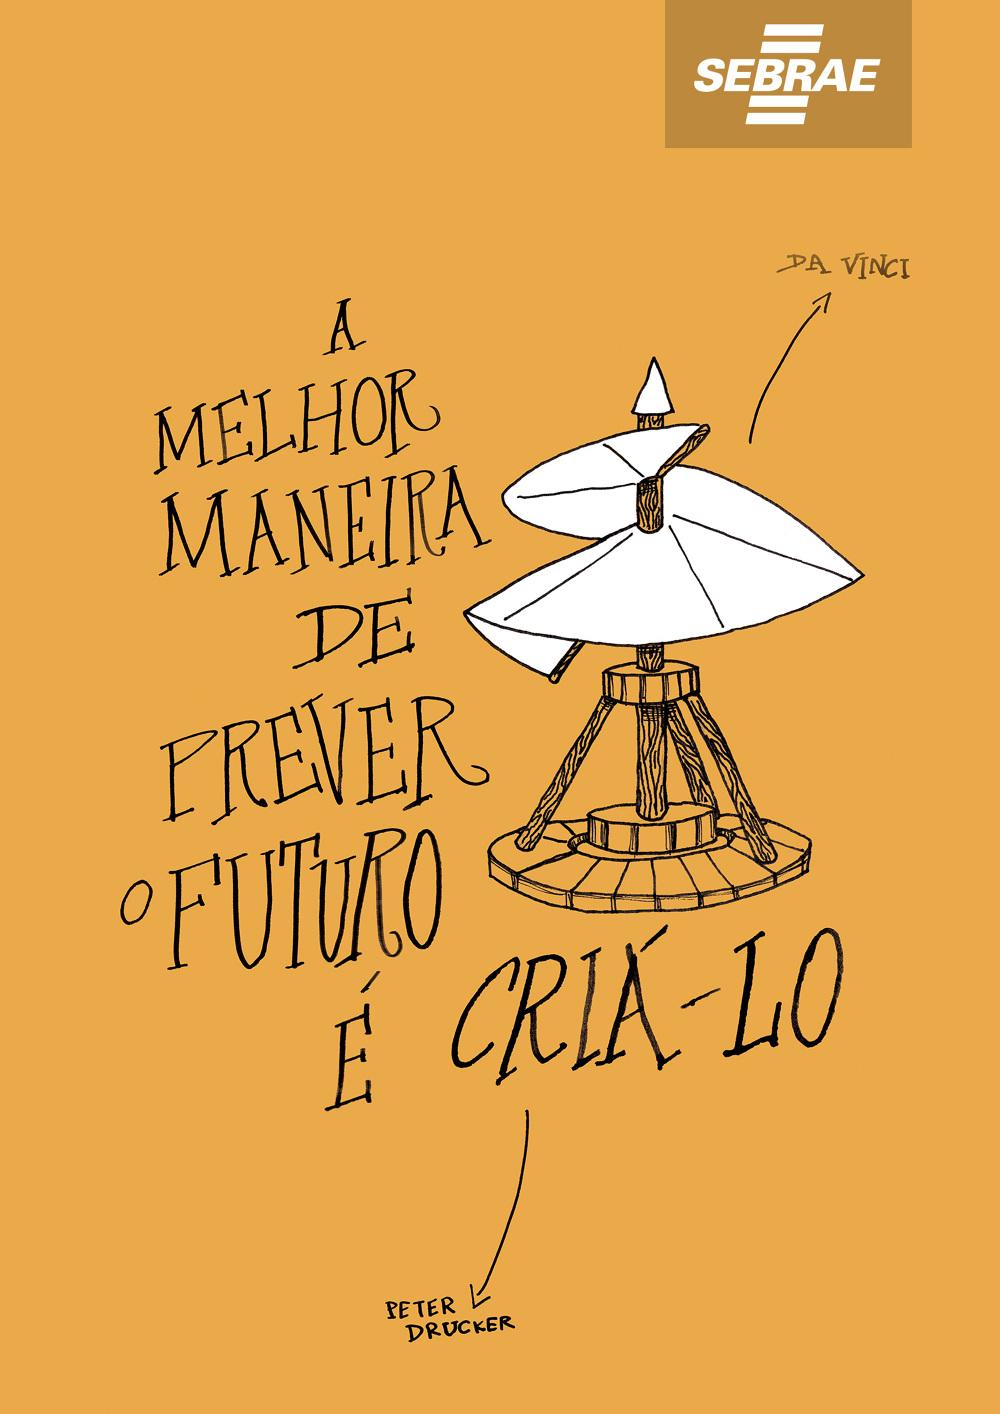 Posters Sebrae Portfólio Do Gabriel Figueiredo